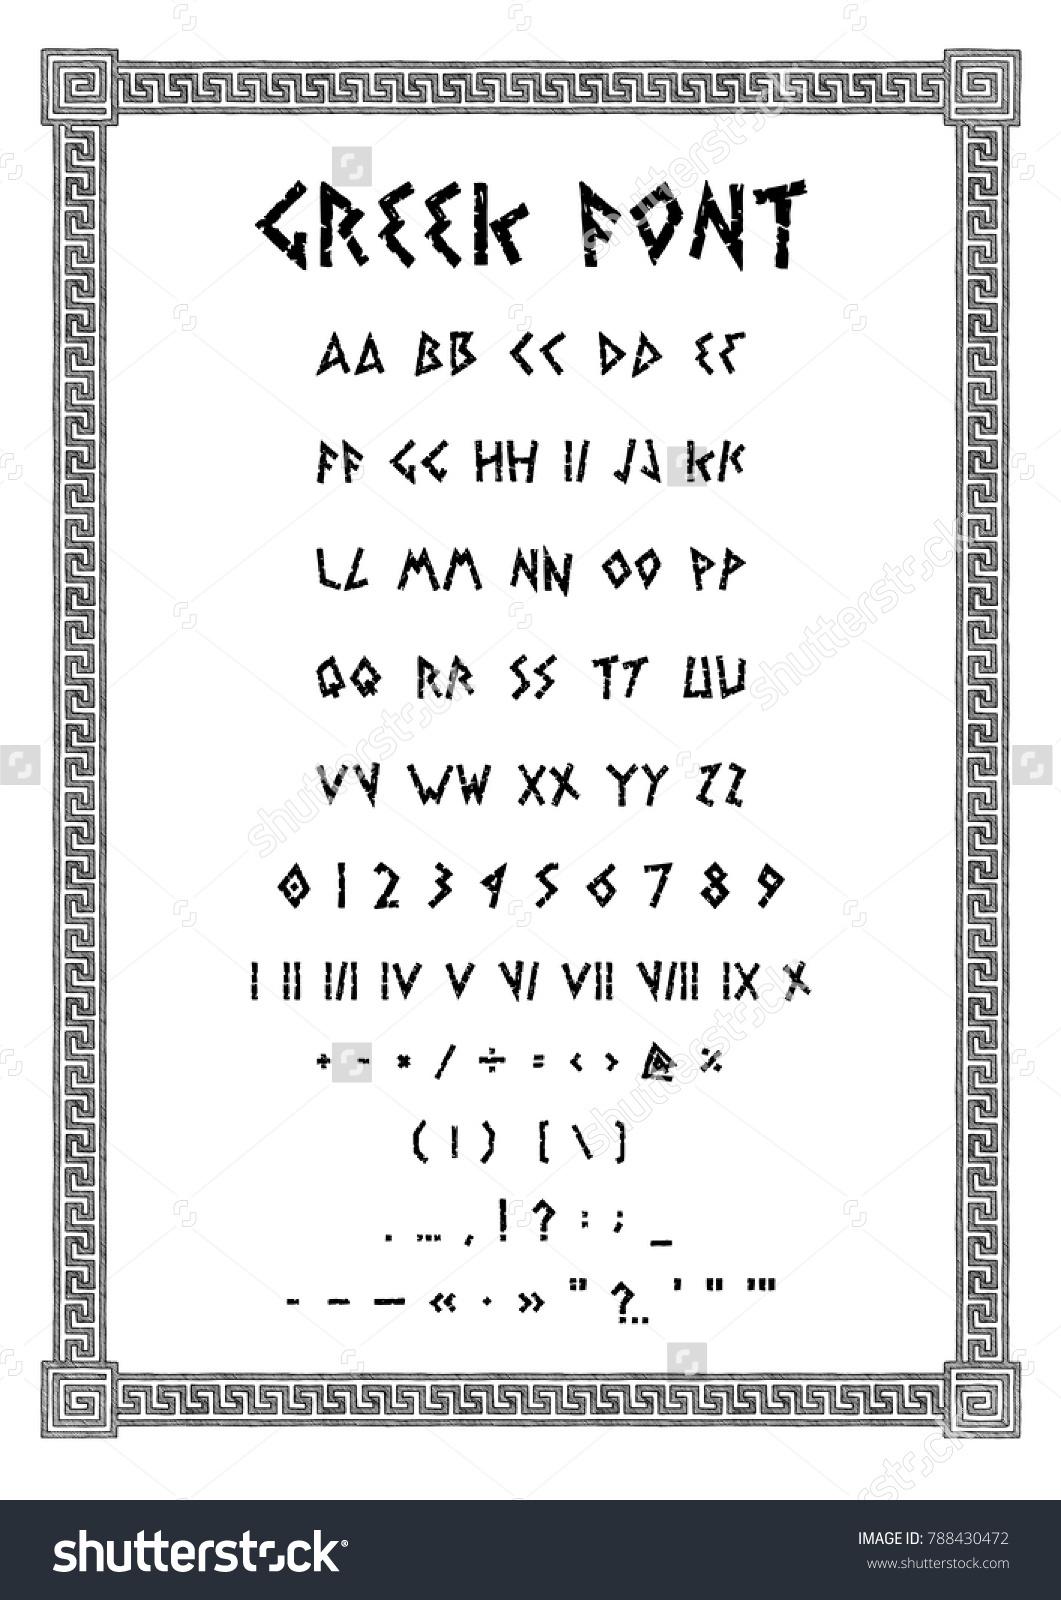 Ancient greek font meander border english stock vector 788430472 ancient greek font with meander border english alphabet punctuation marks roman and arabic biocorpaavc